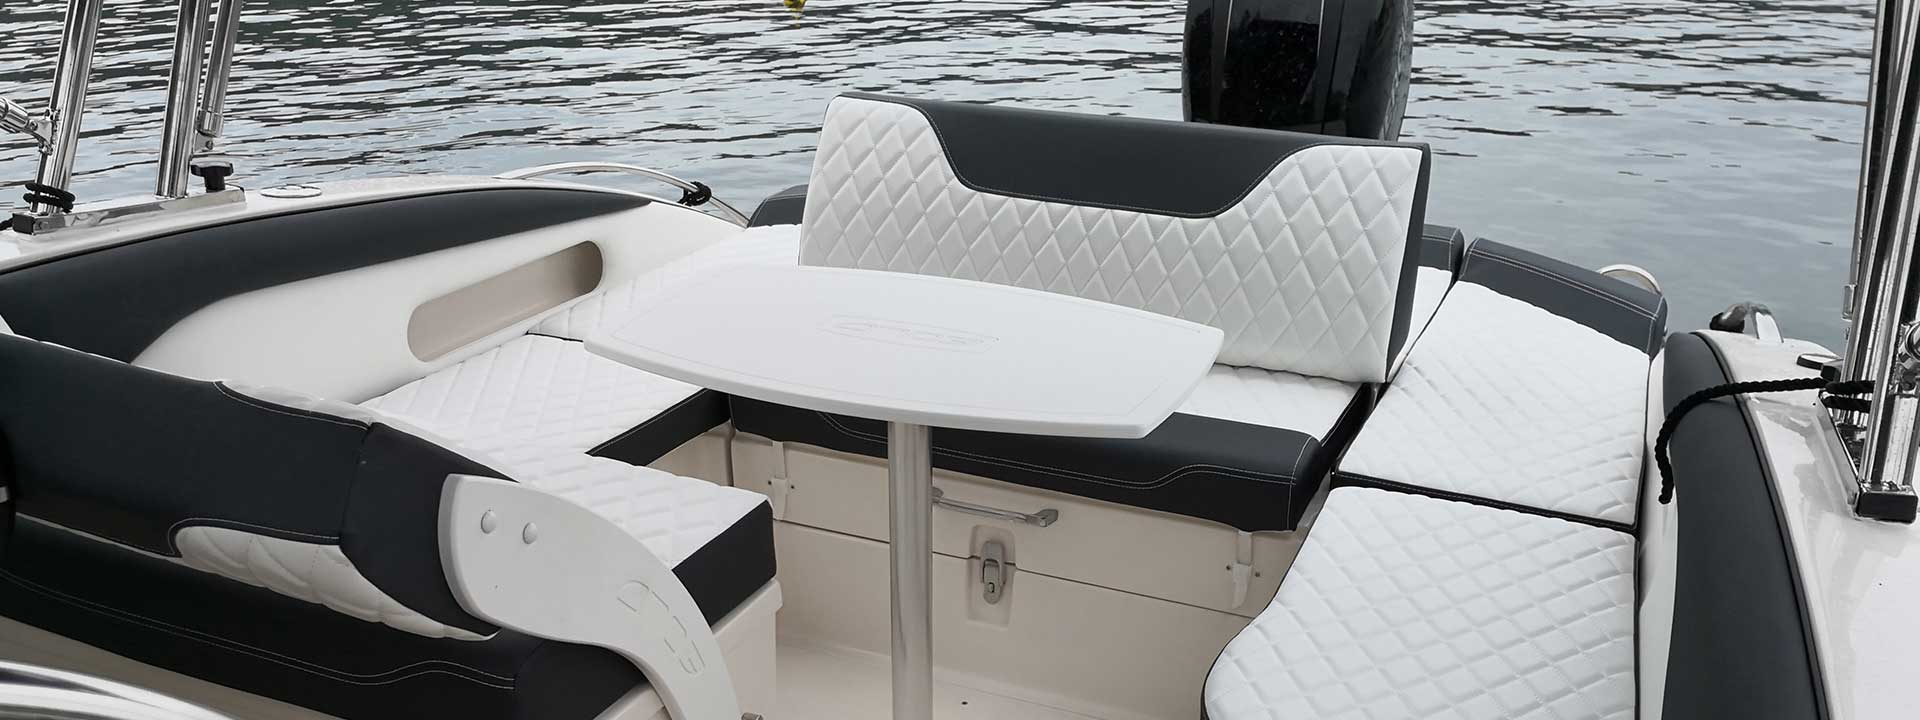 mayer-charter-boat-header-eolo-730-day-03